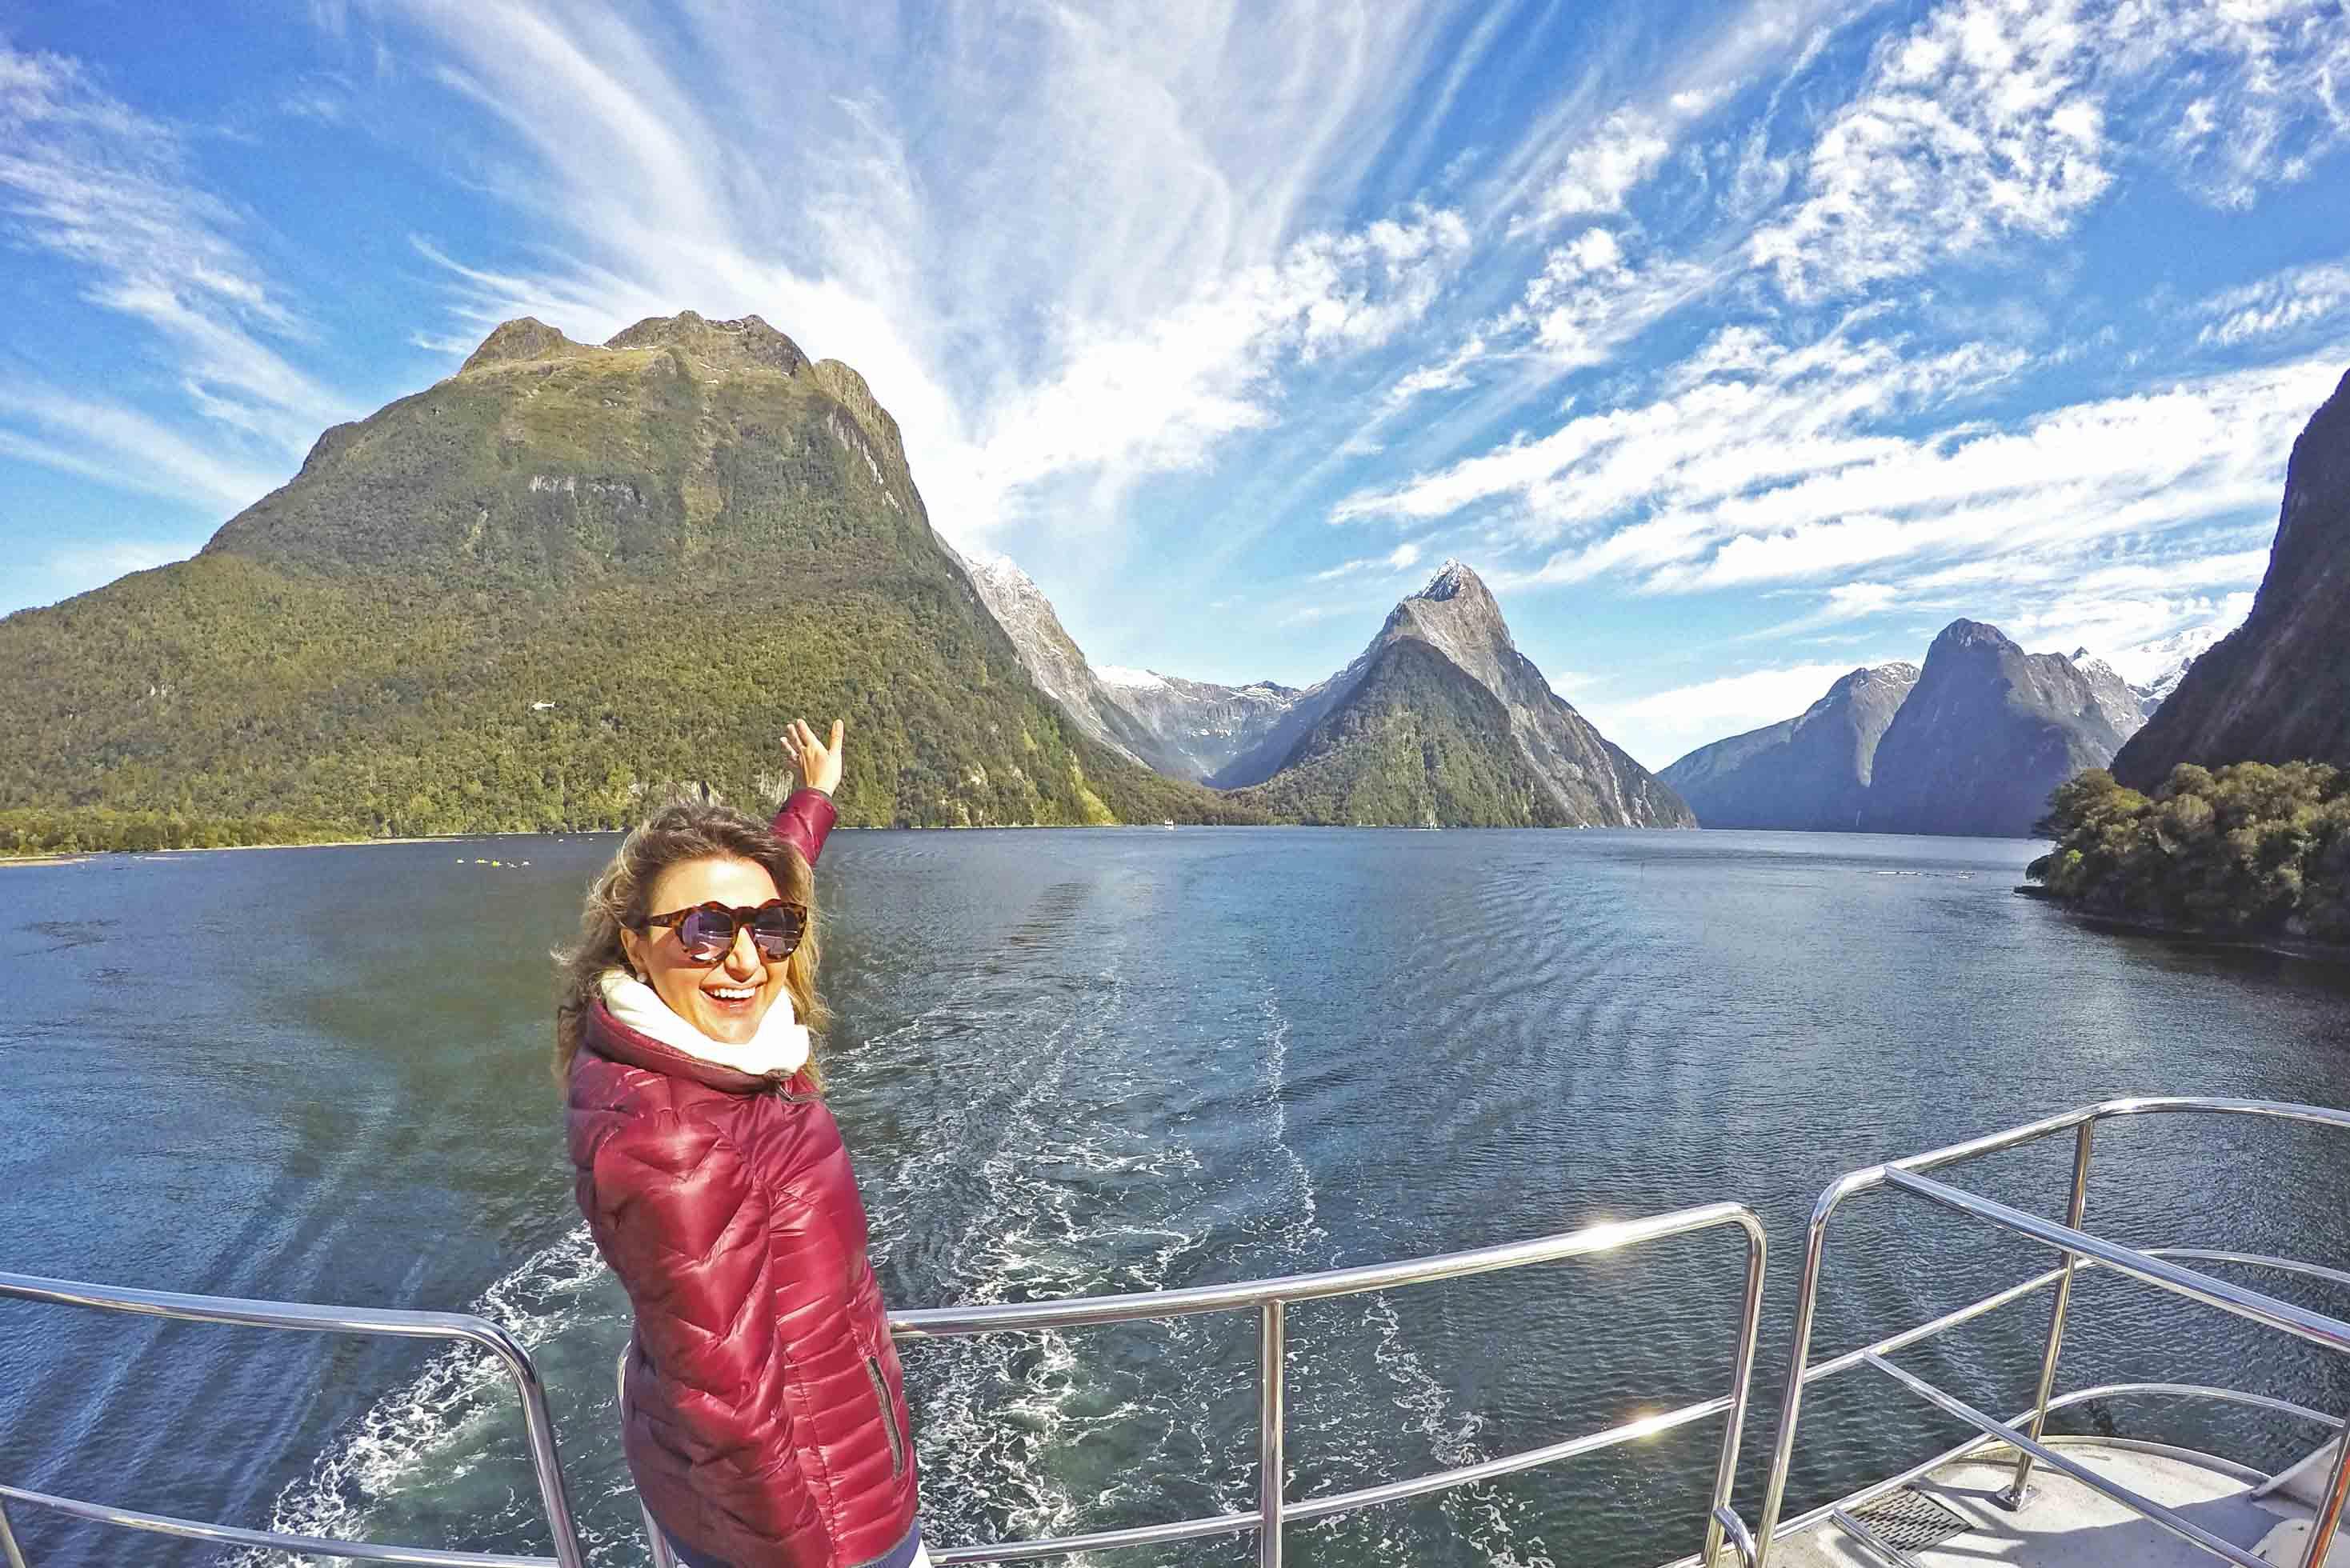 Lua de mel mes a mes - ONDE IR LUA DE MEL SETEMBRO - NOVA ZELANDIA